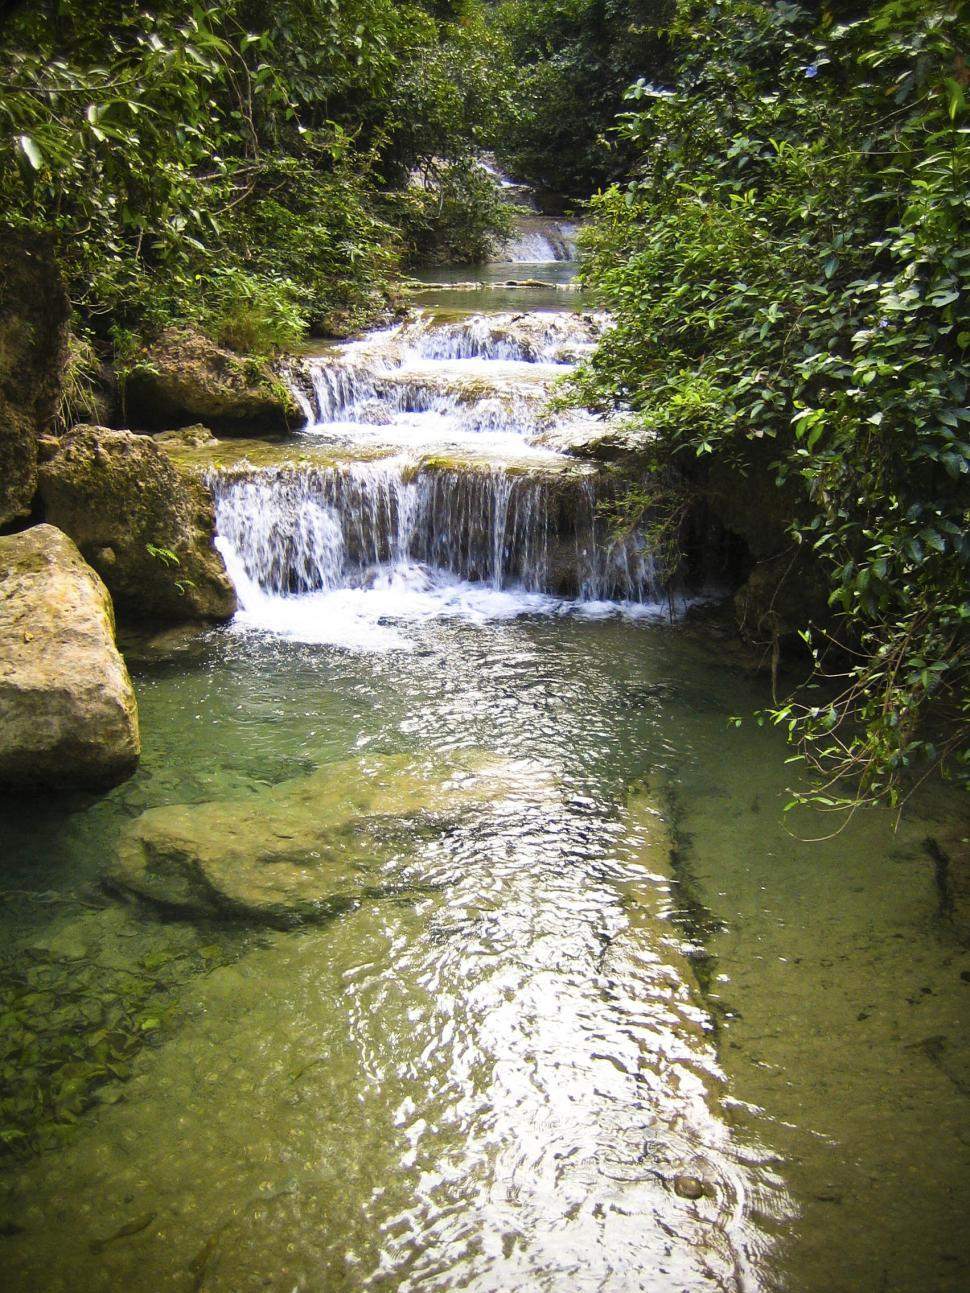 Download Free Stock HD Photo of Waterfalls on creek Online